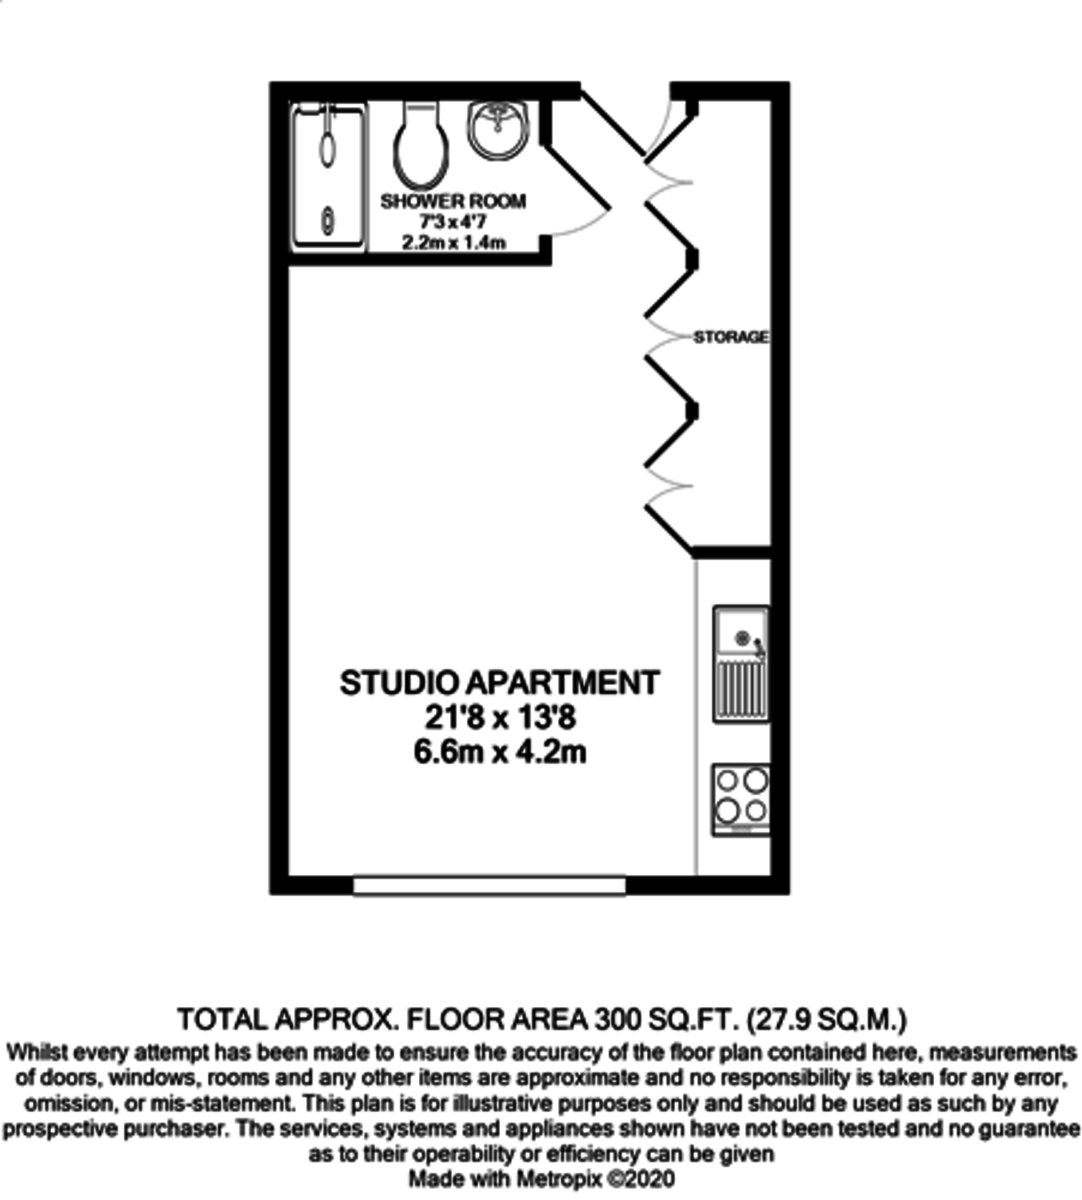 The Cube East, 196 Wharfside Street, Birmingham City Centre floorplan 1 of 1